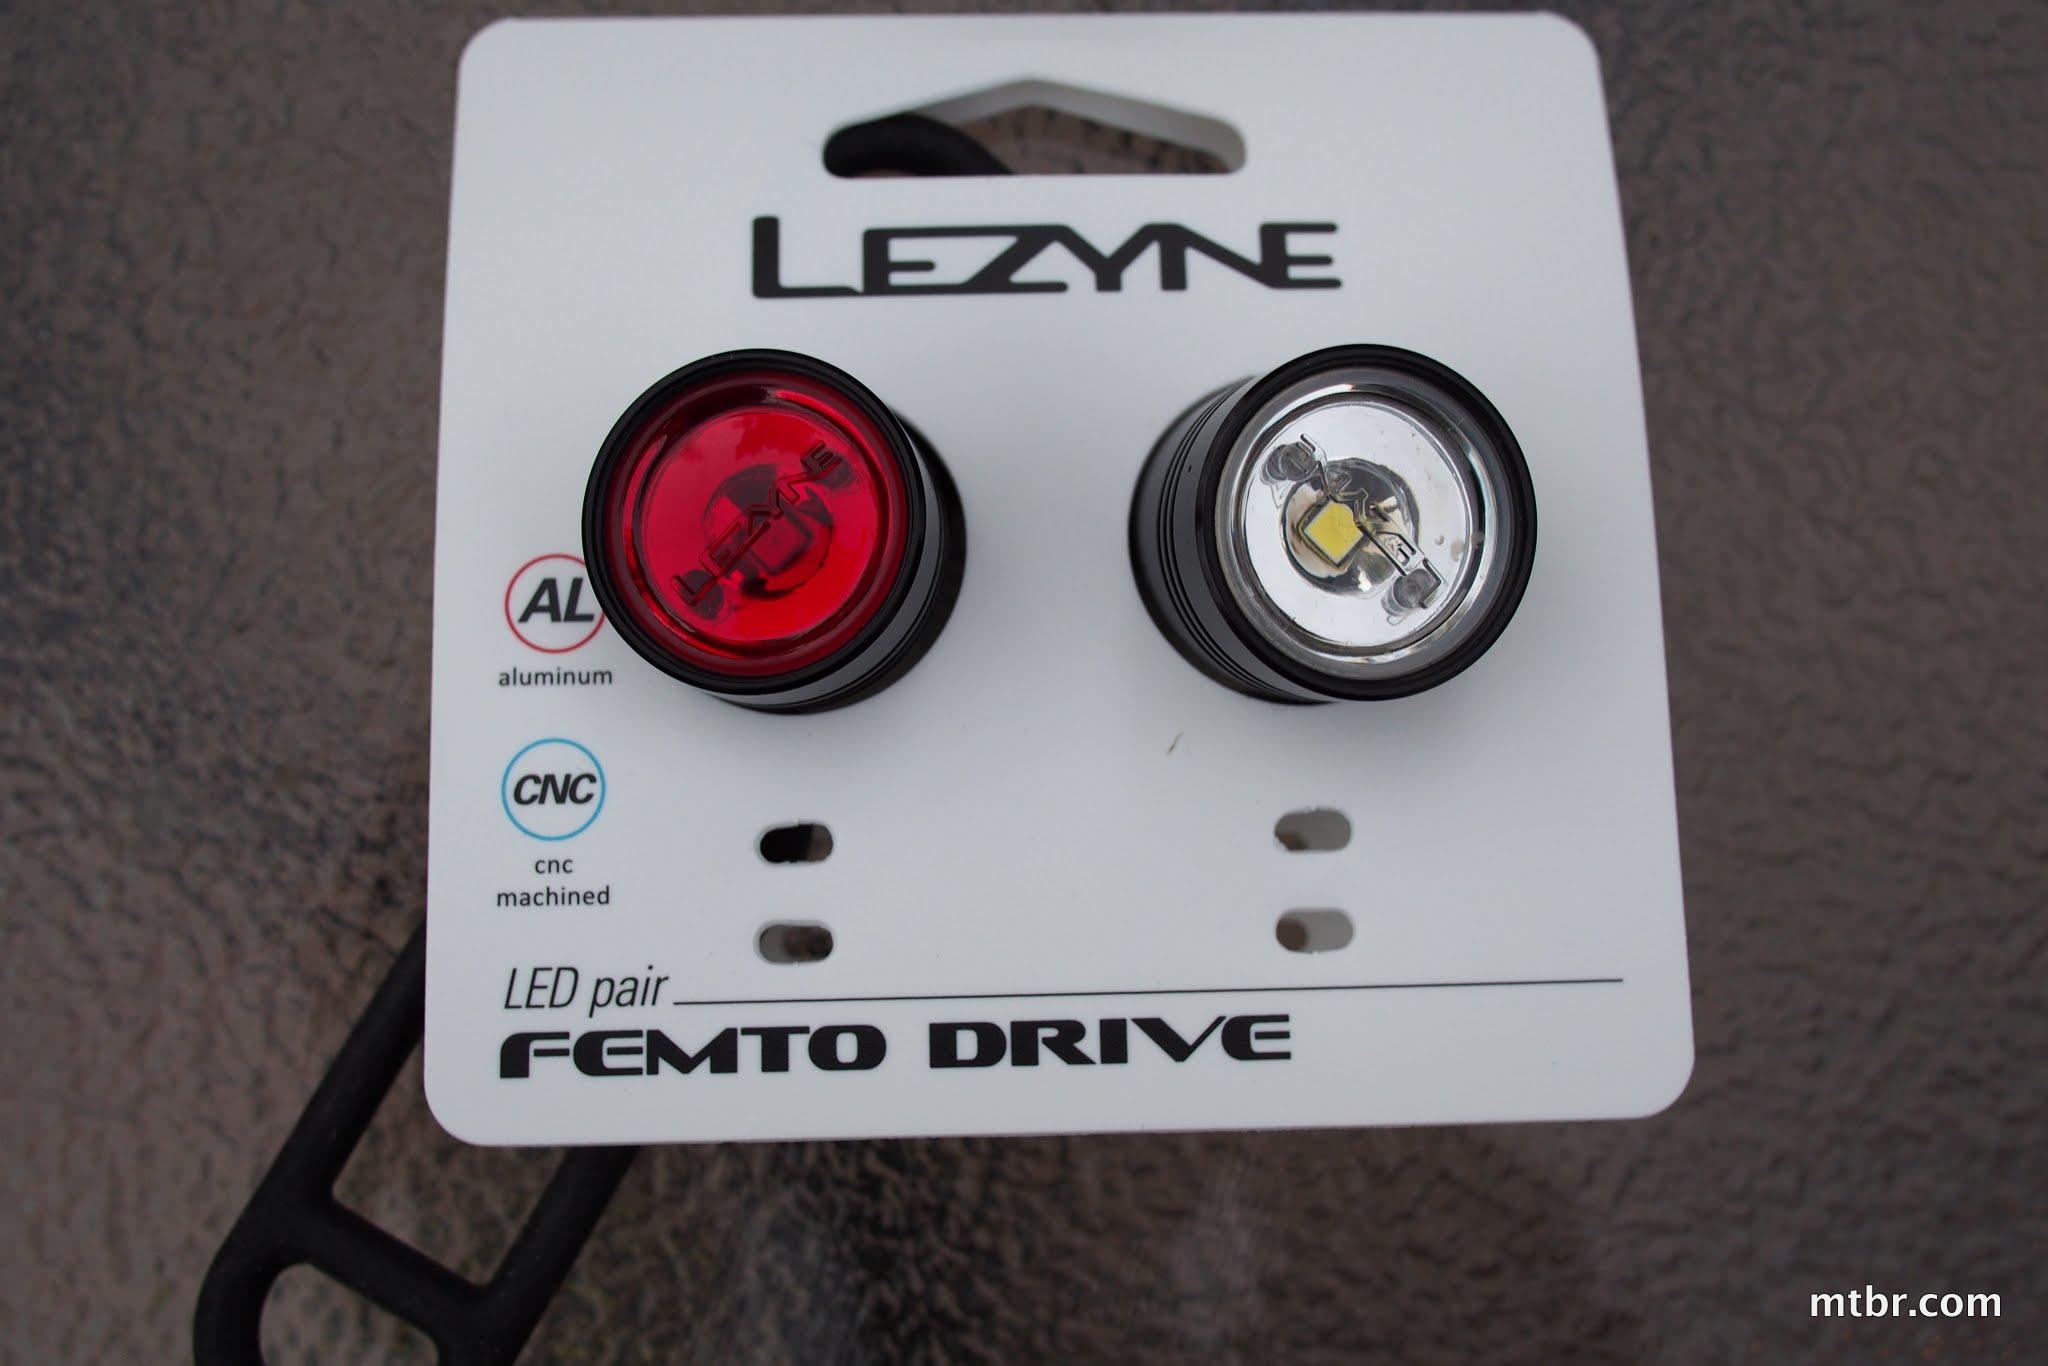 Lezyne Femto Drive